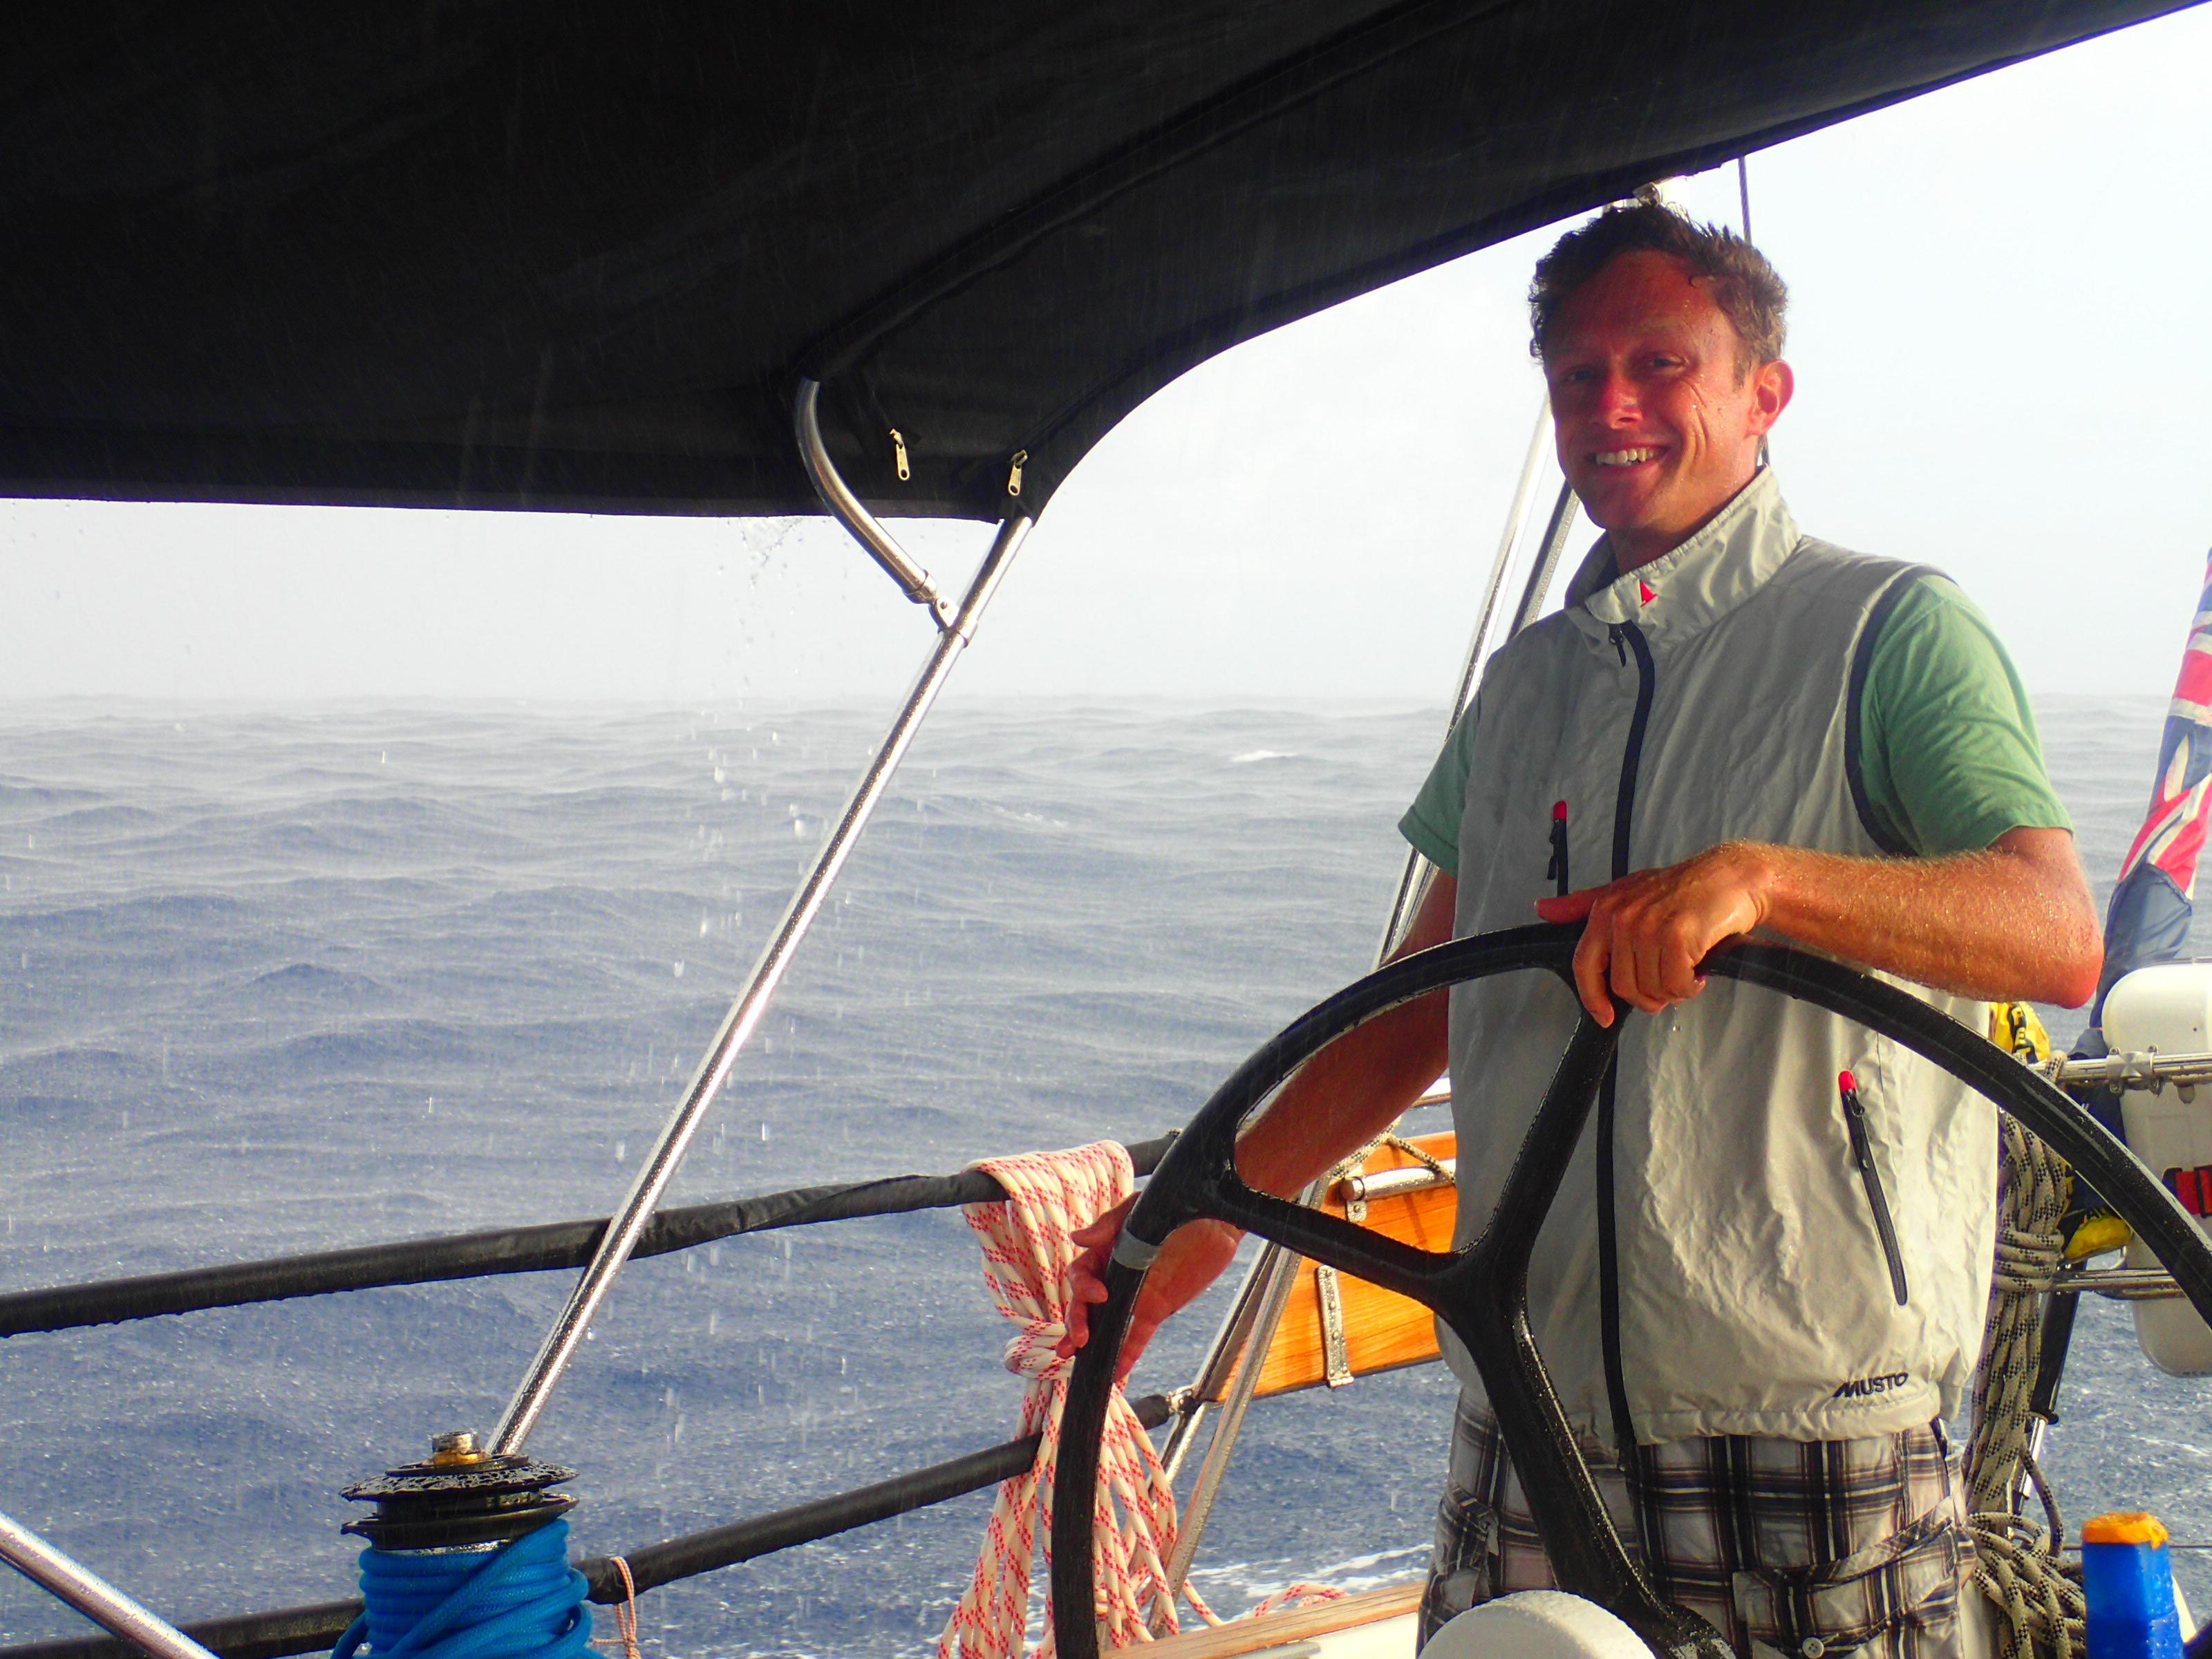 Seaway Simon Phillips